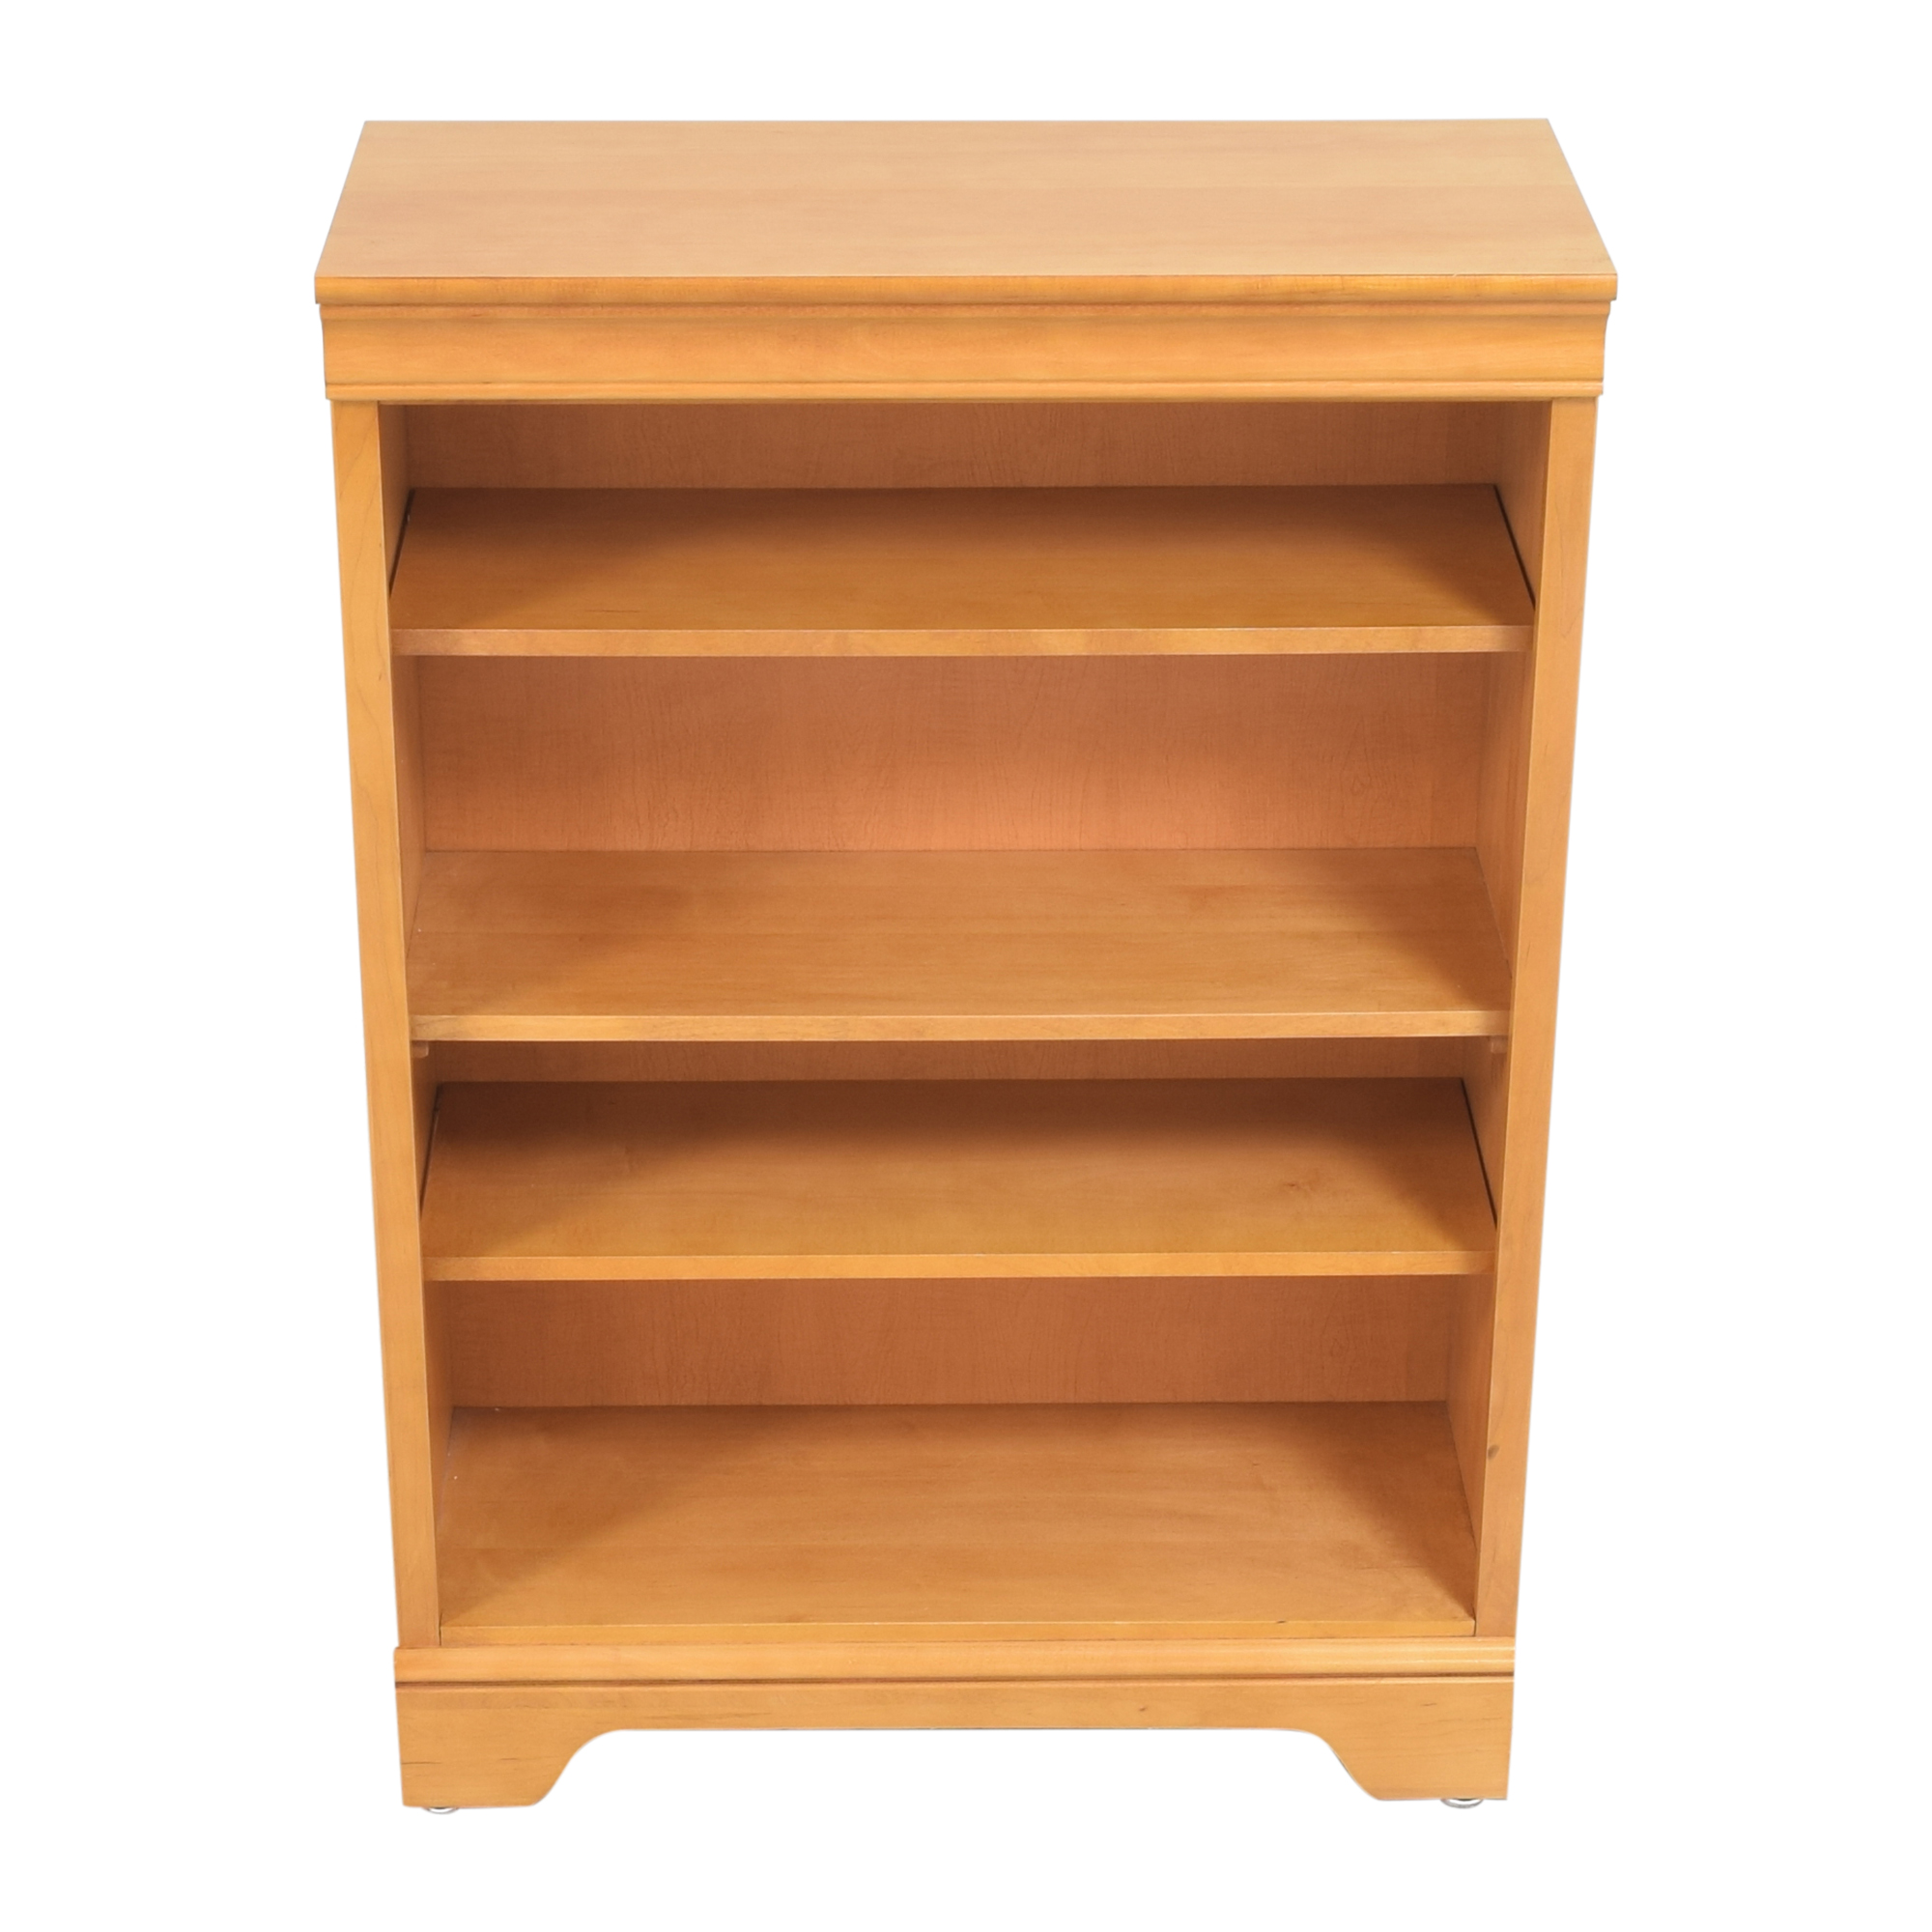 Stanley Furniture Stanley Furniture Four Shelf Bookcase on sale